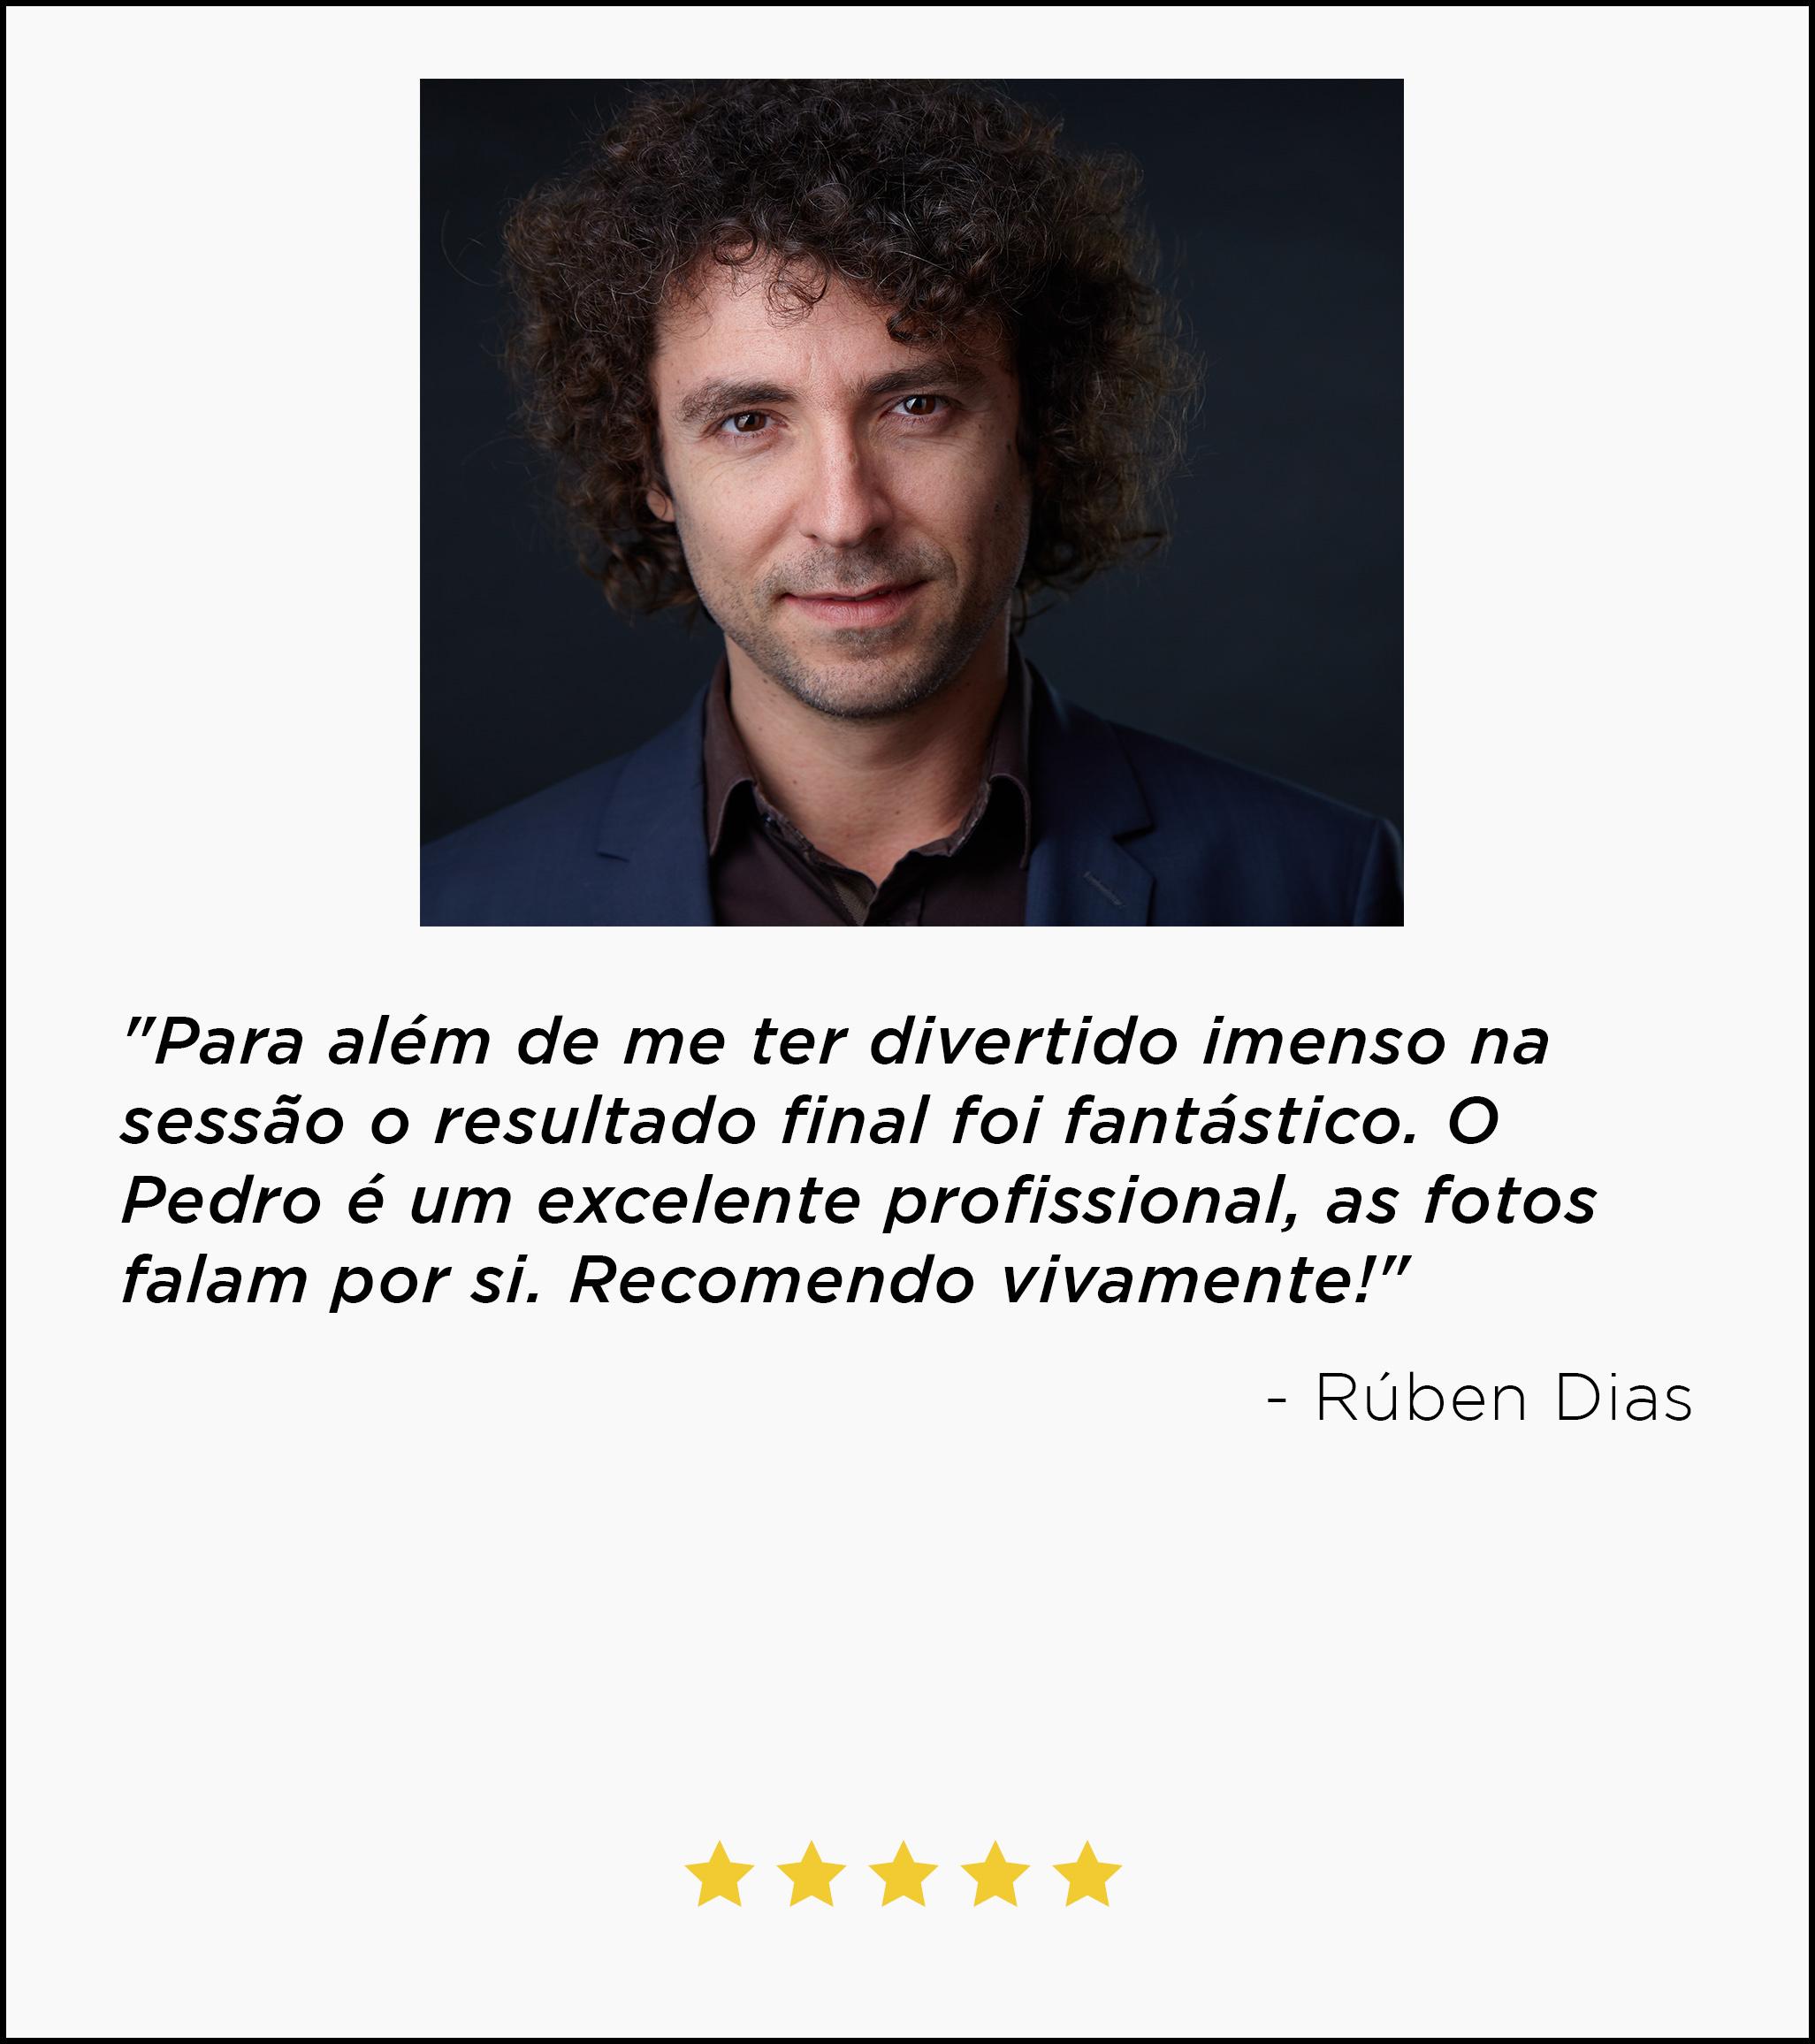 Rúben Dias.jpg